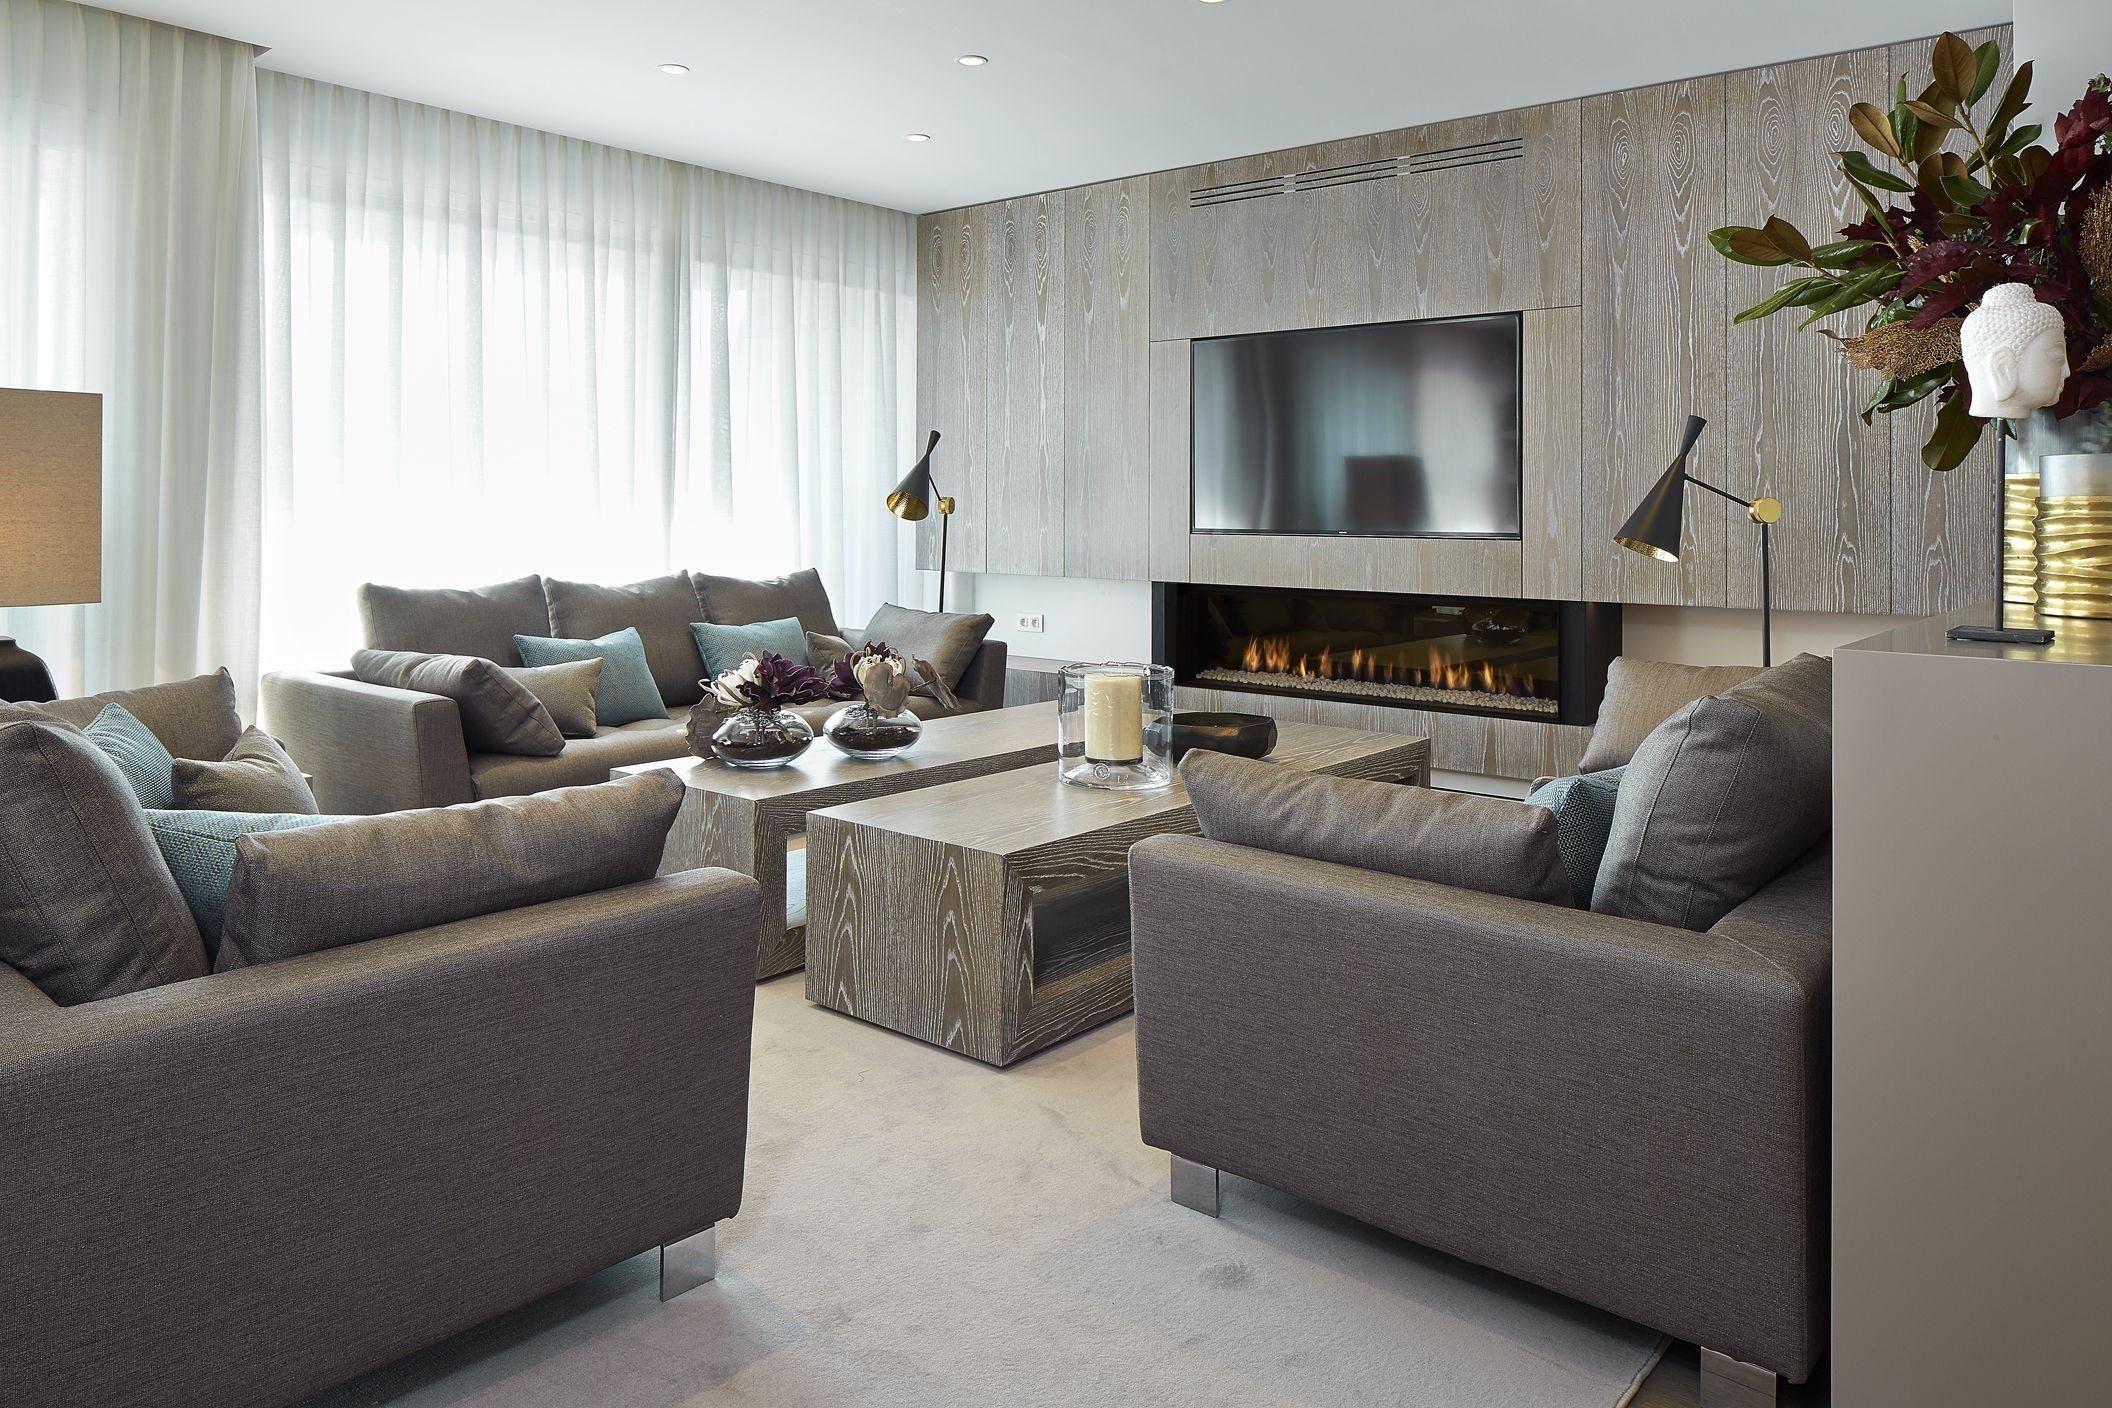 Molins interiors arquitectura interior interiorismo - Decoracion de chimeneas ...